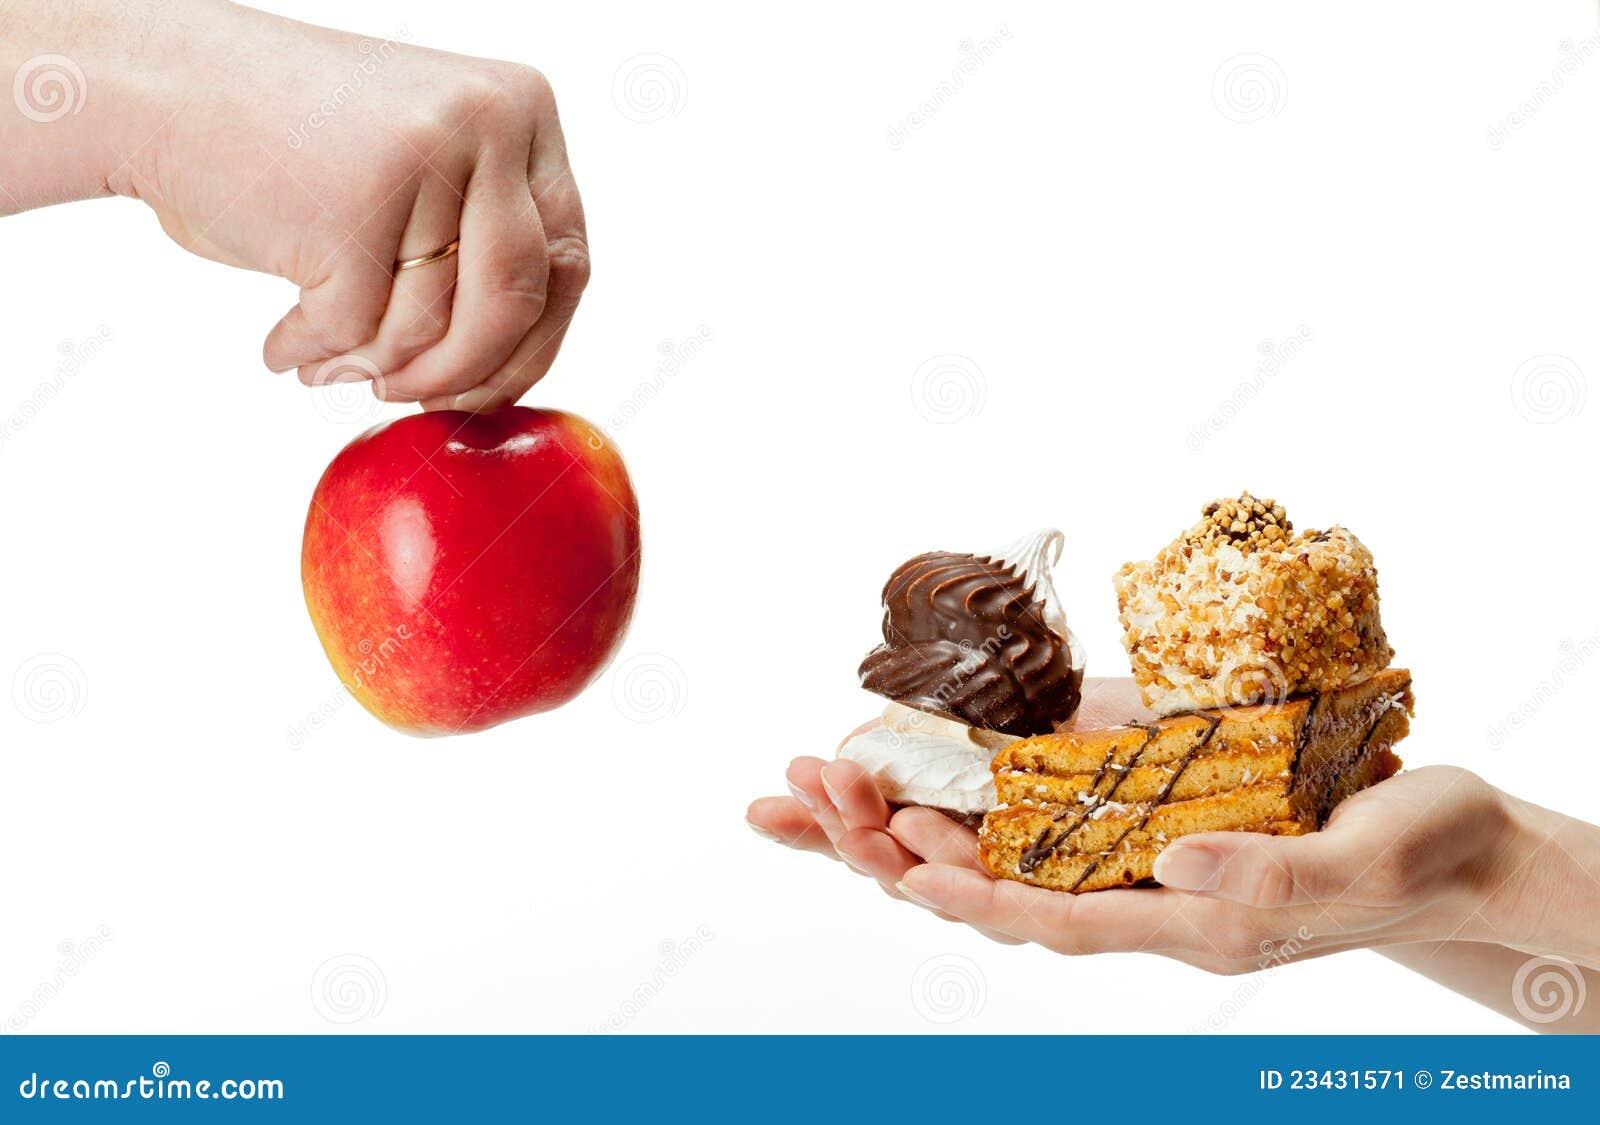 Unhealthy healthy meal